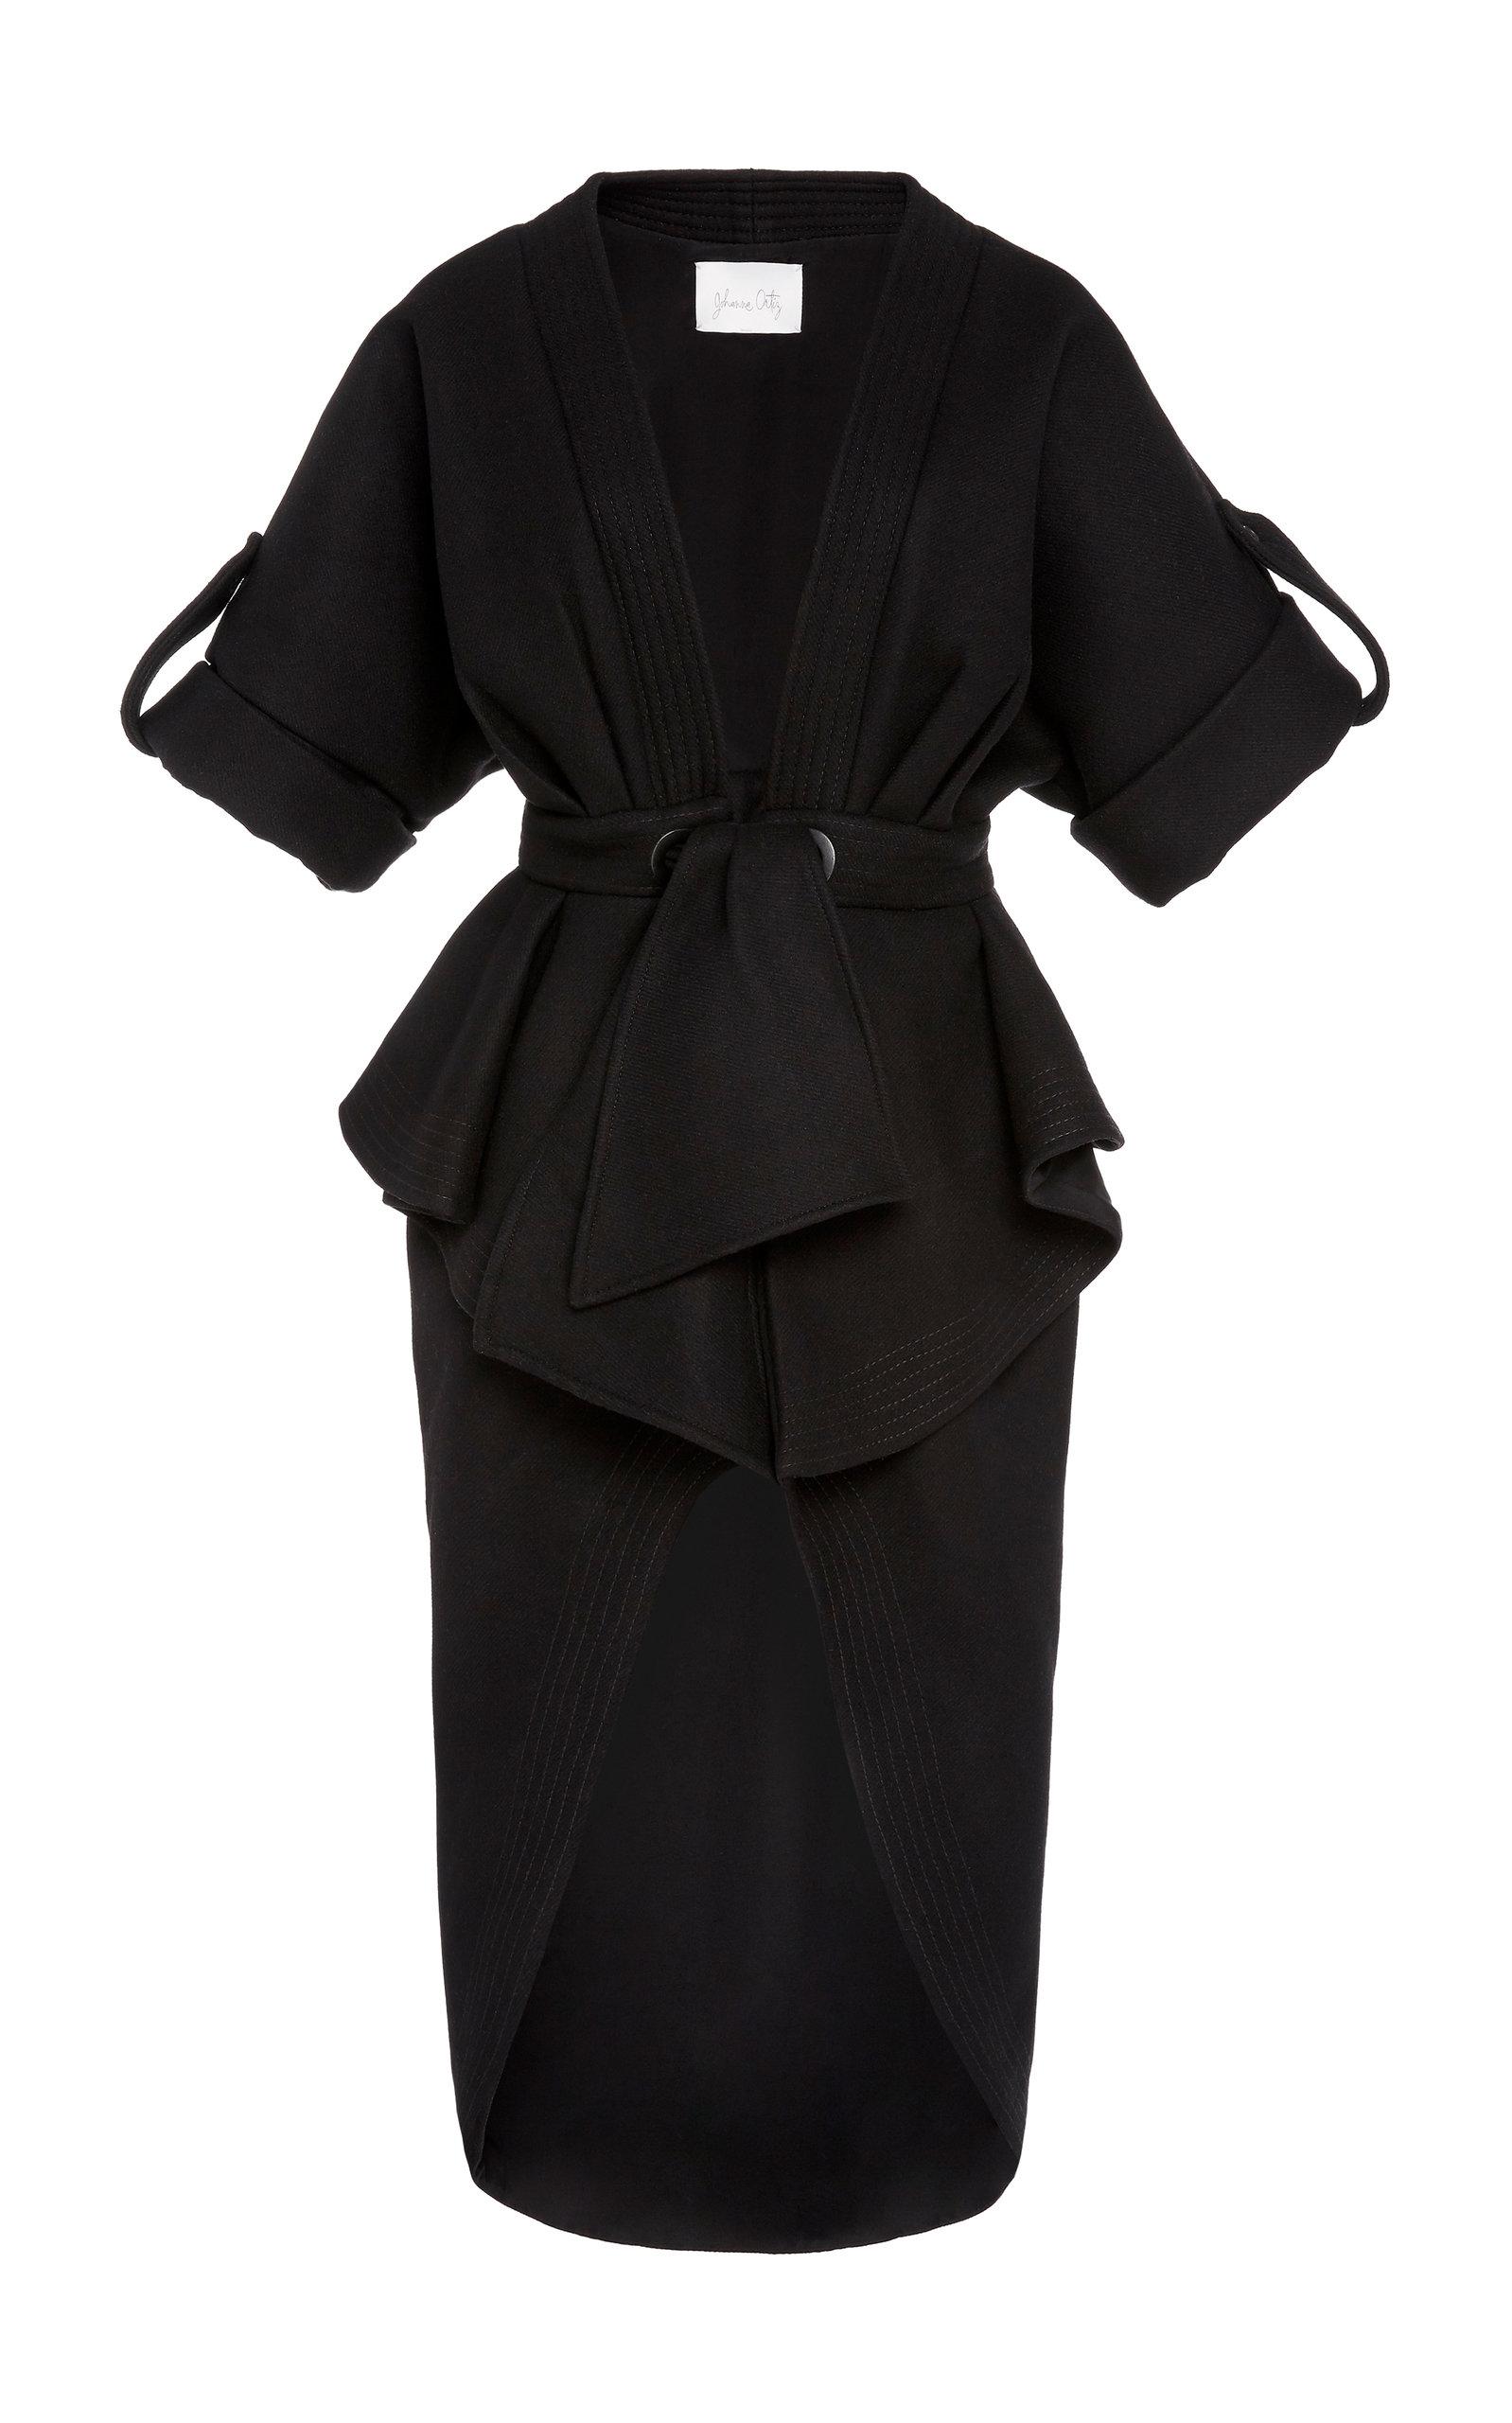 Buy Johanna Ortiz Glorious Finding Wool-Blend Crepe Peplum Midi Dress online, shop Johanna Ortiz at the best price